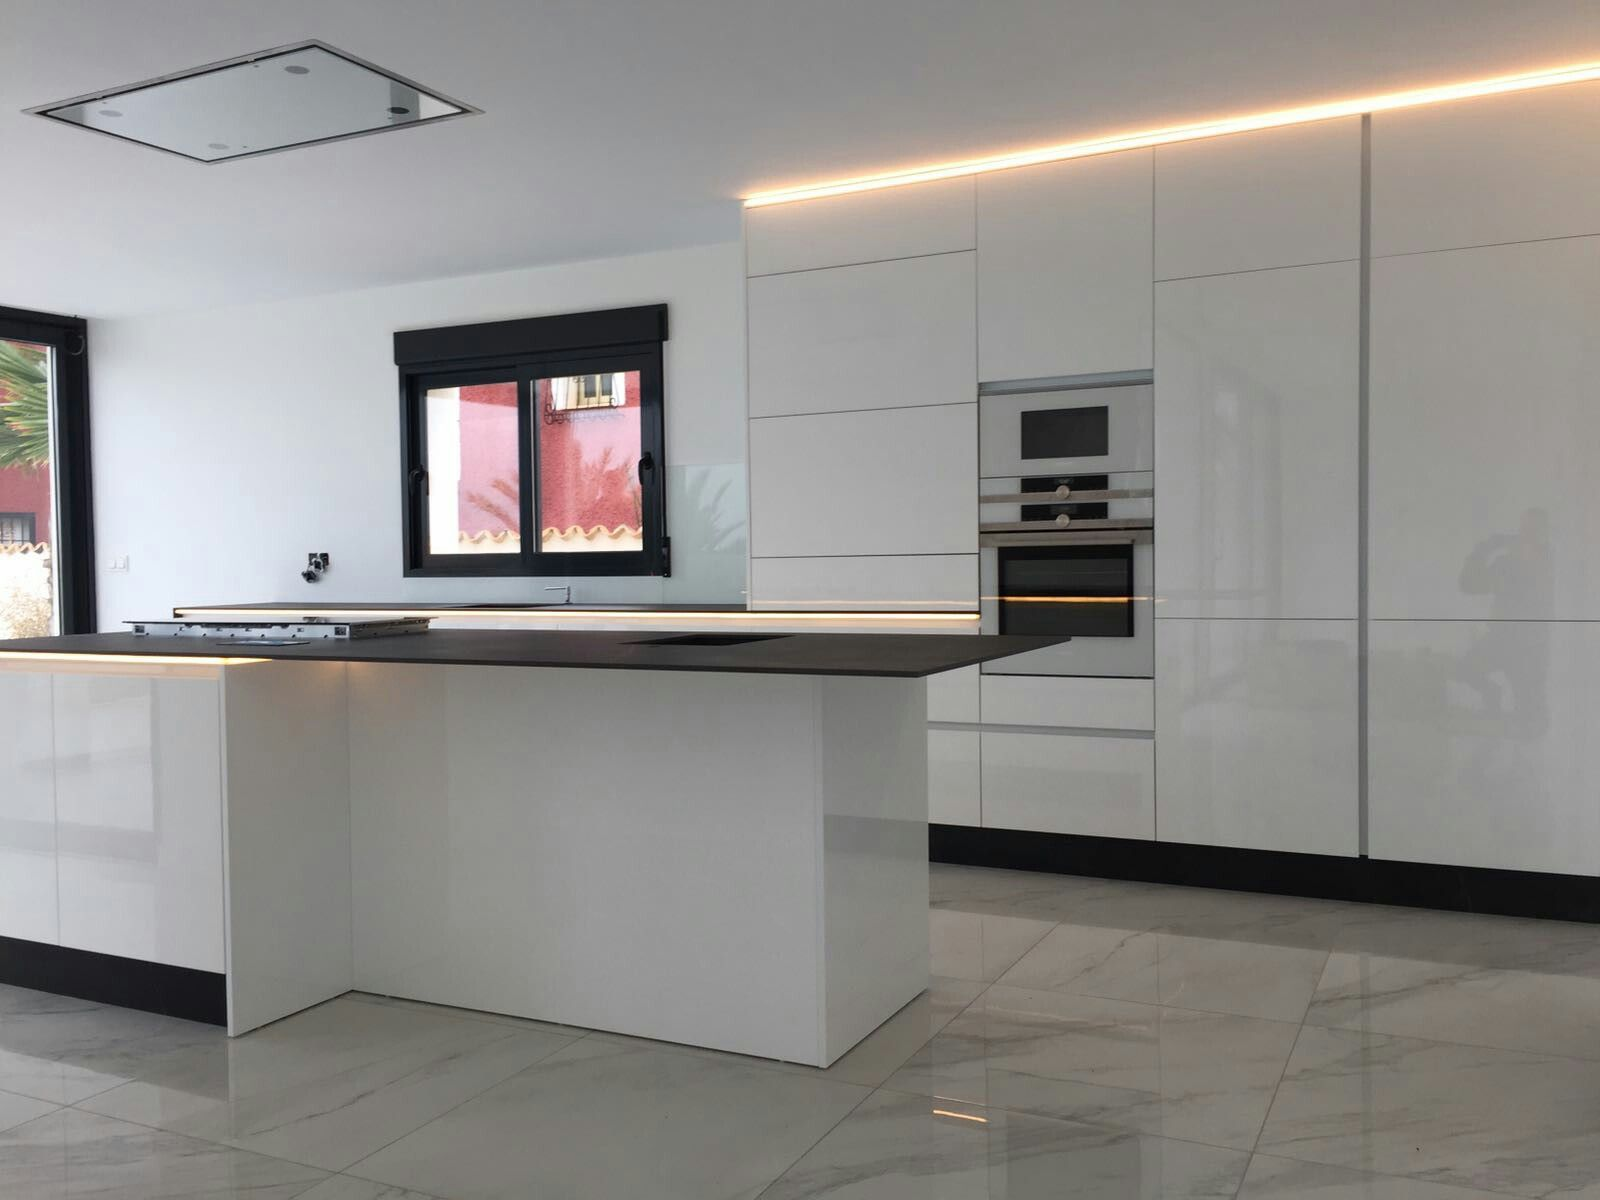 Grifflose Küche Ikea Fotos >> Wit Kookeiland Met Wit Blad Google ...